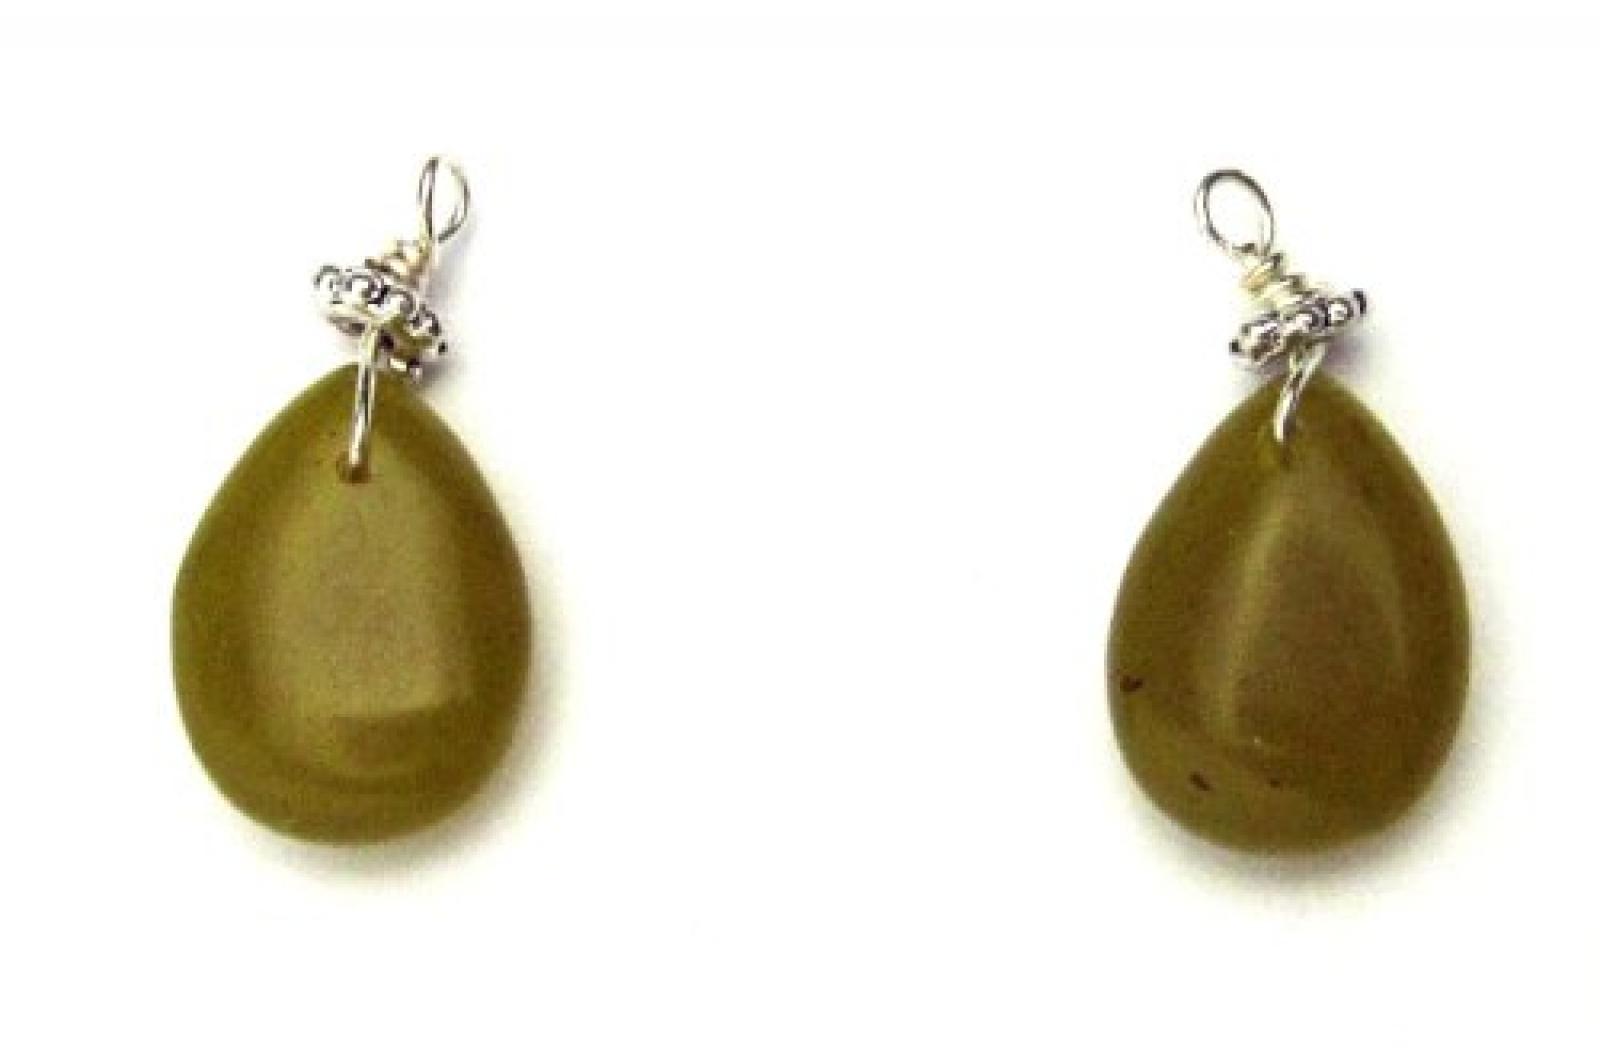 PILGRIM 511-028 Ohrring-Charms Anhänger, versilbert, grün